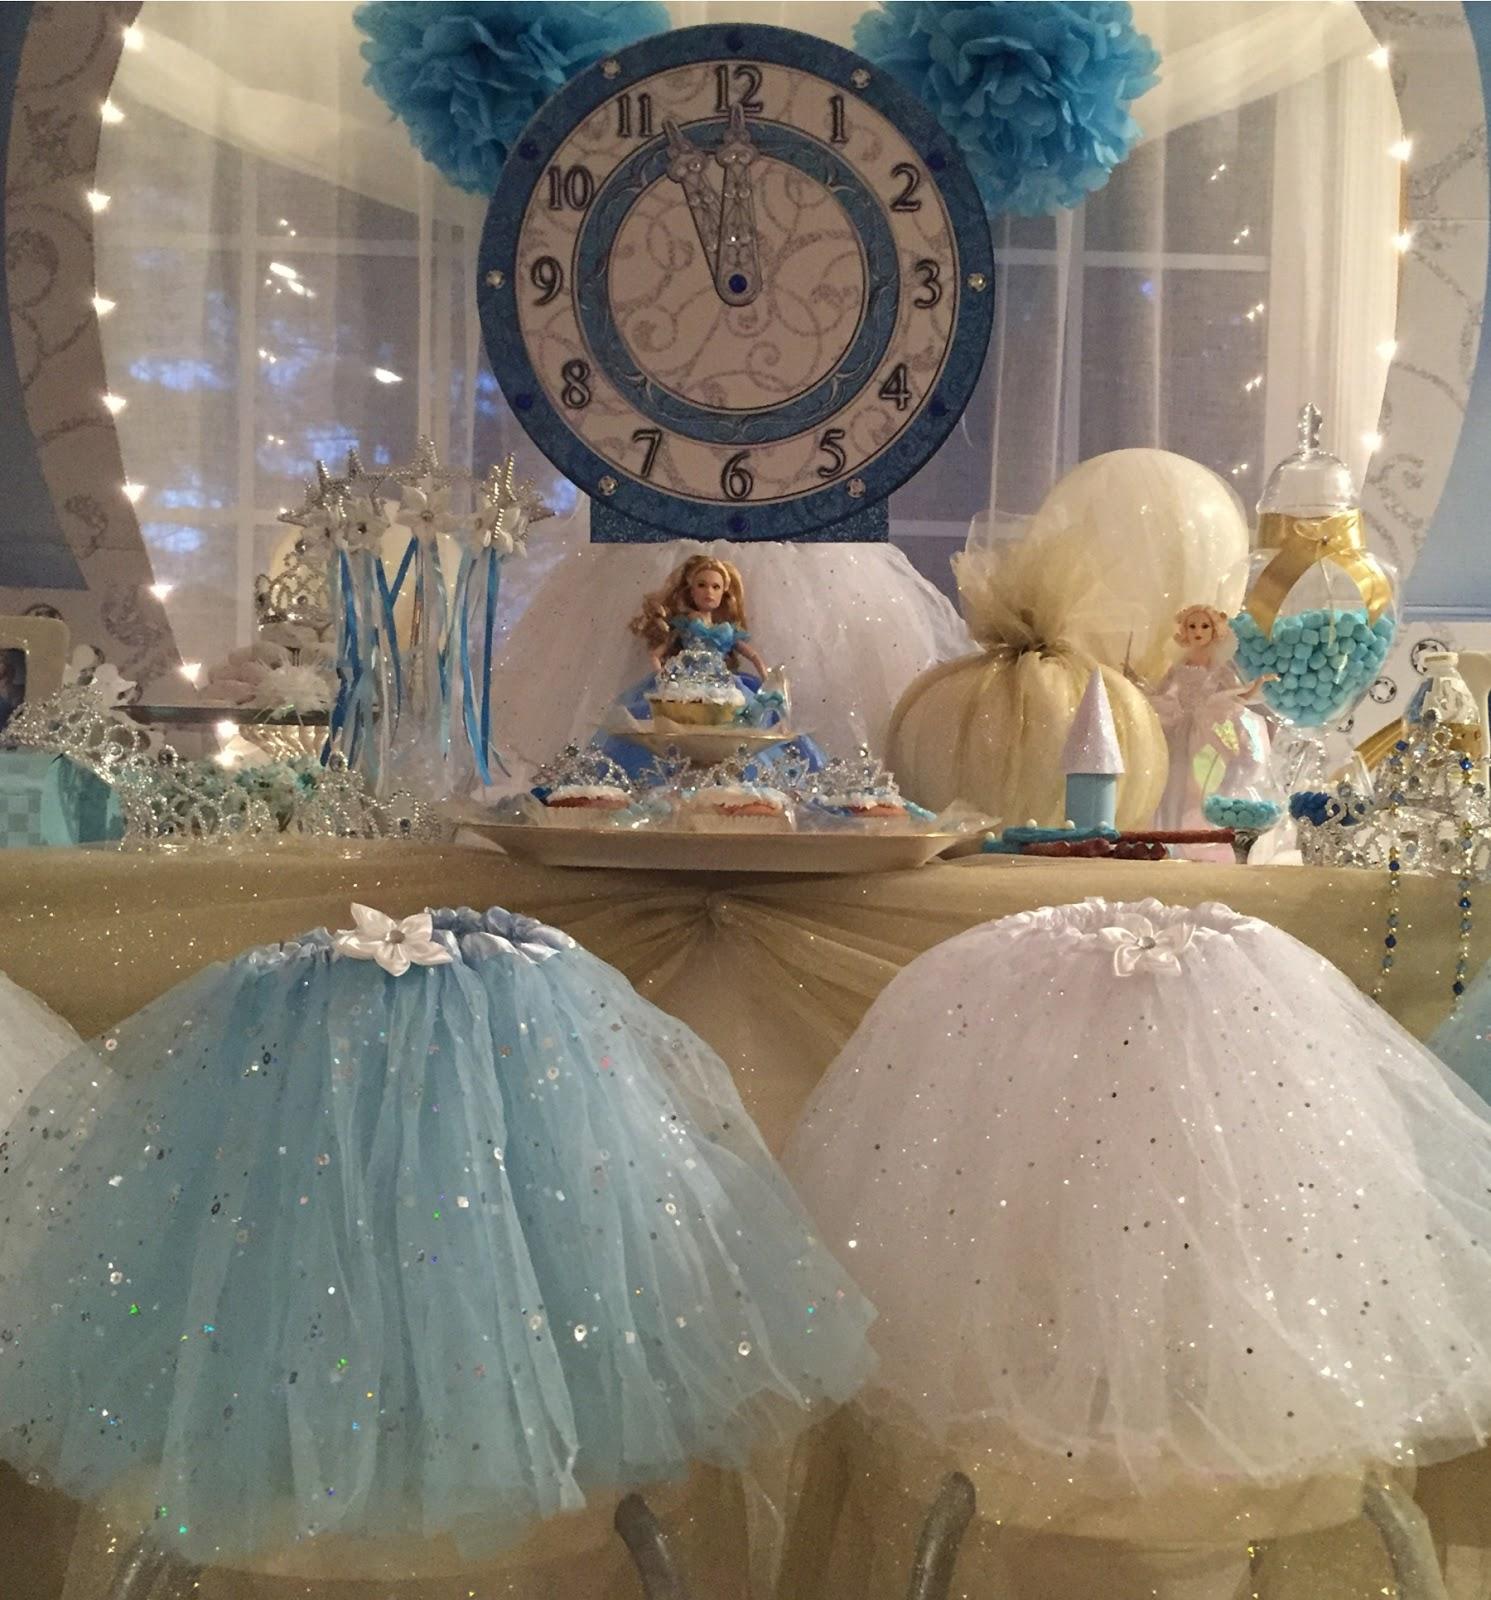 The Princess Birthday Blog: Cinderella Party Giveaway